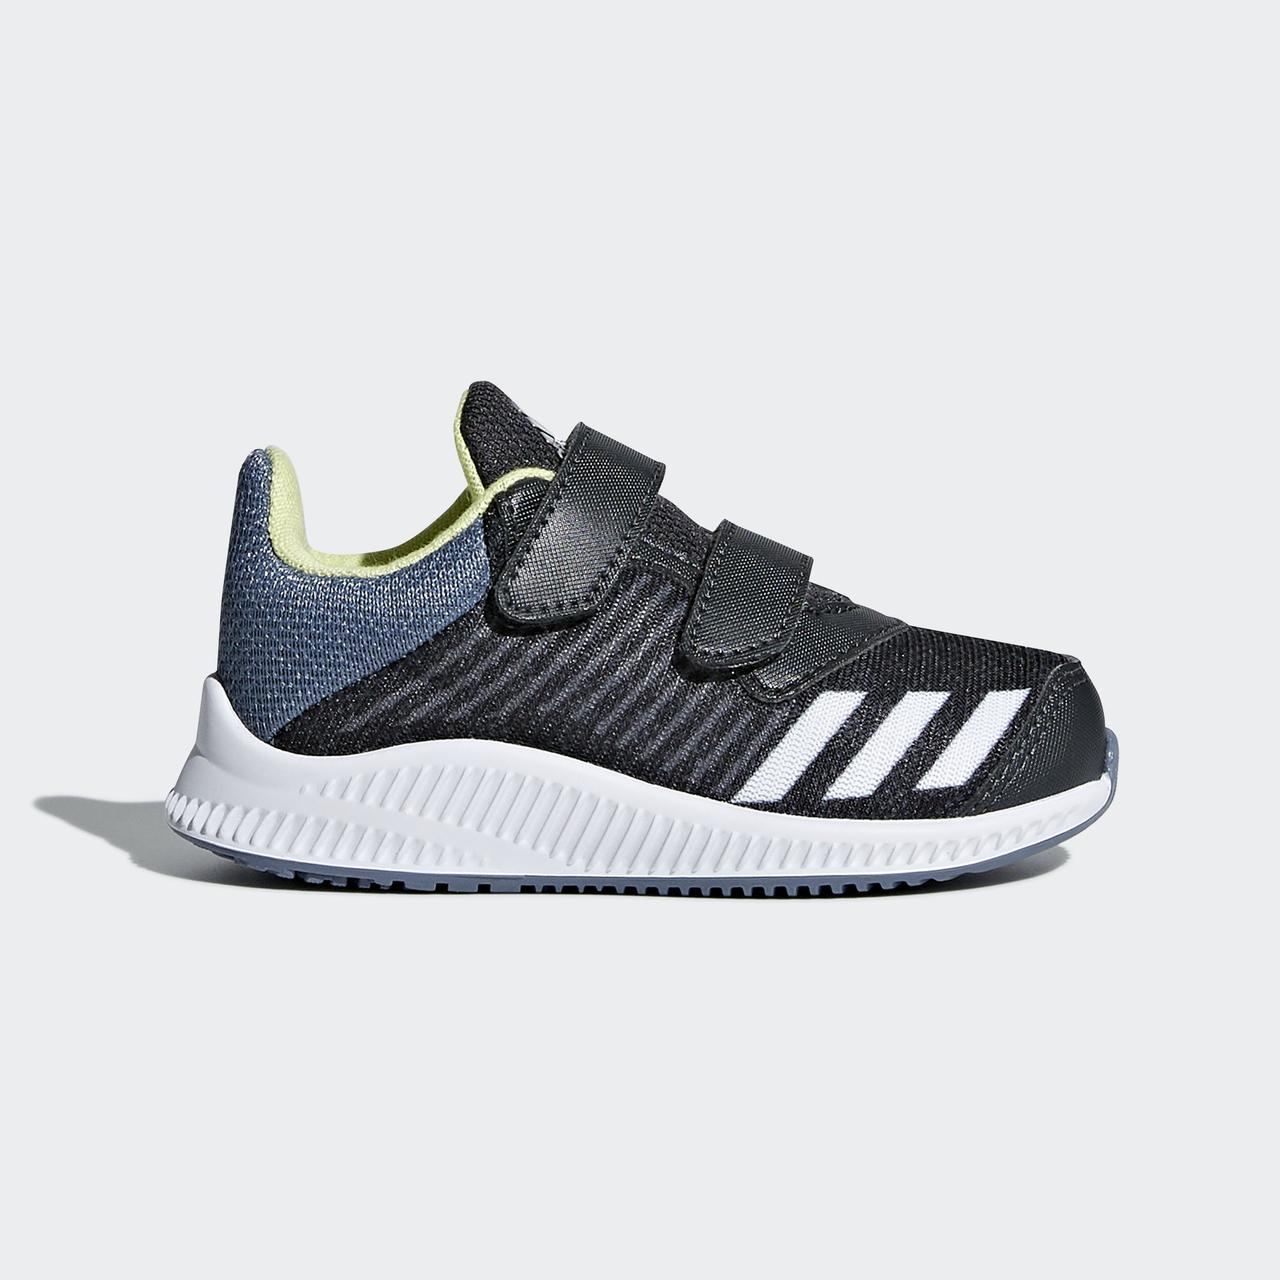 6acc347b97fa Детские кроссовки Adidas Performance Fortarun (Артикул  B42155) - Интернет- магазин «Эксперт